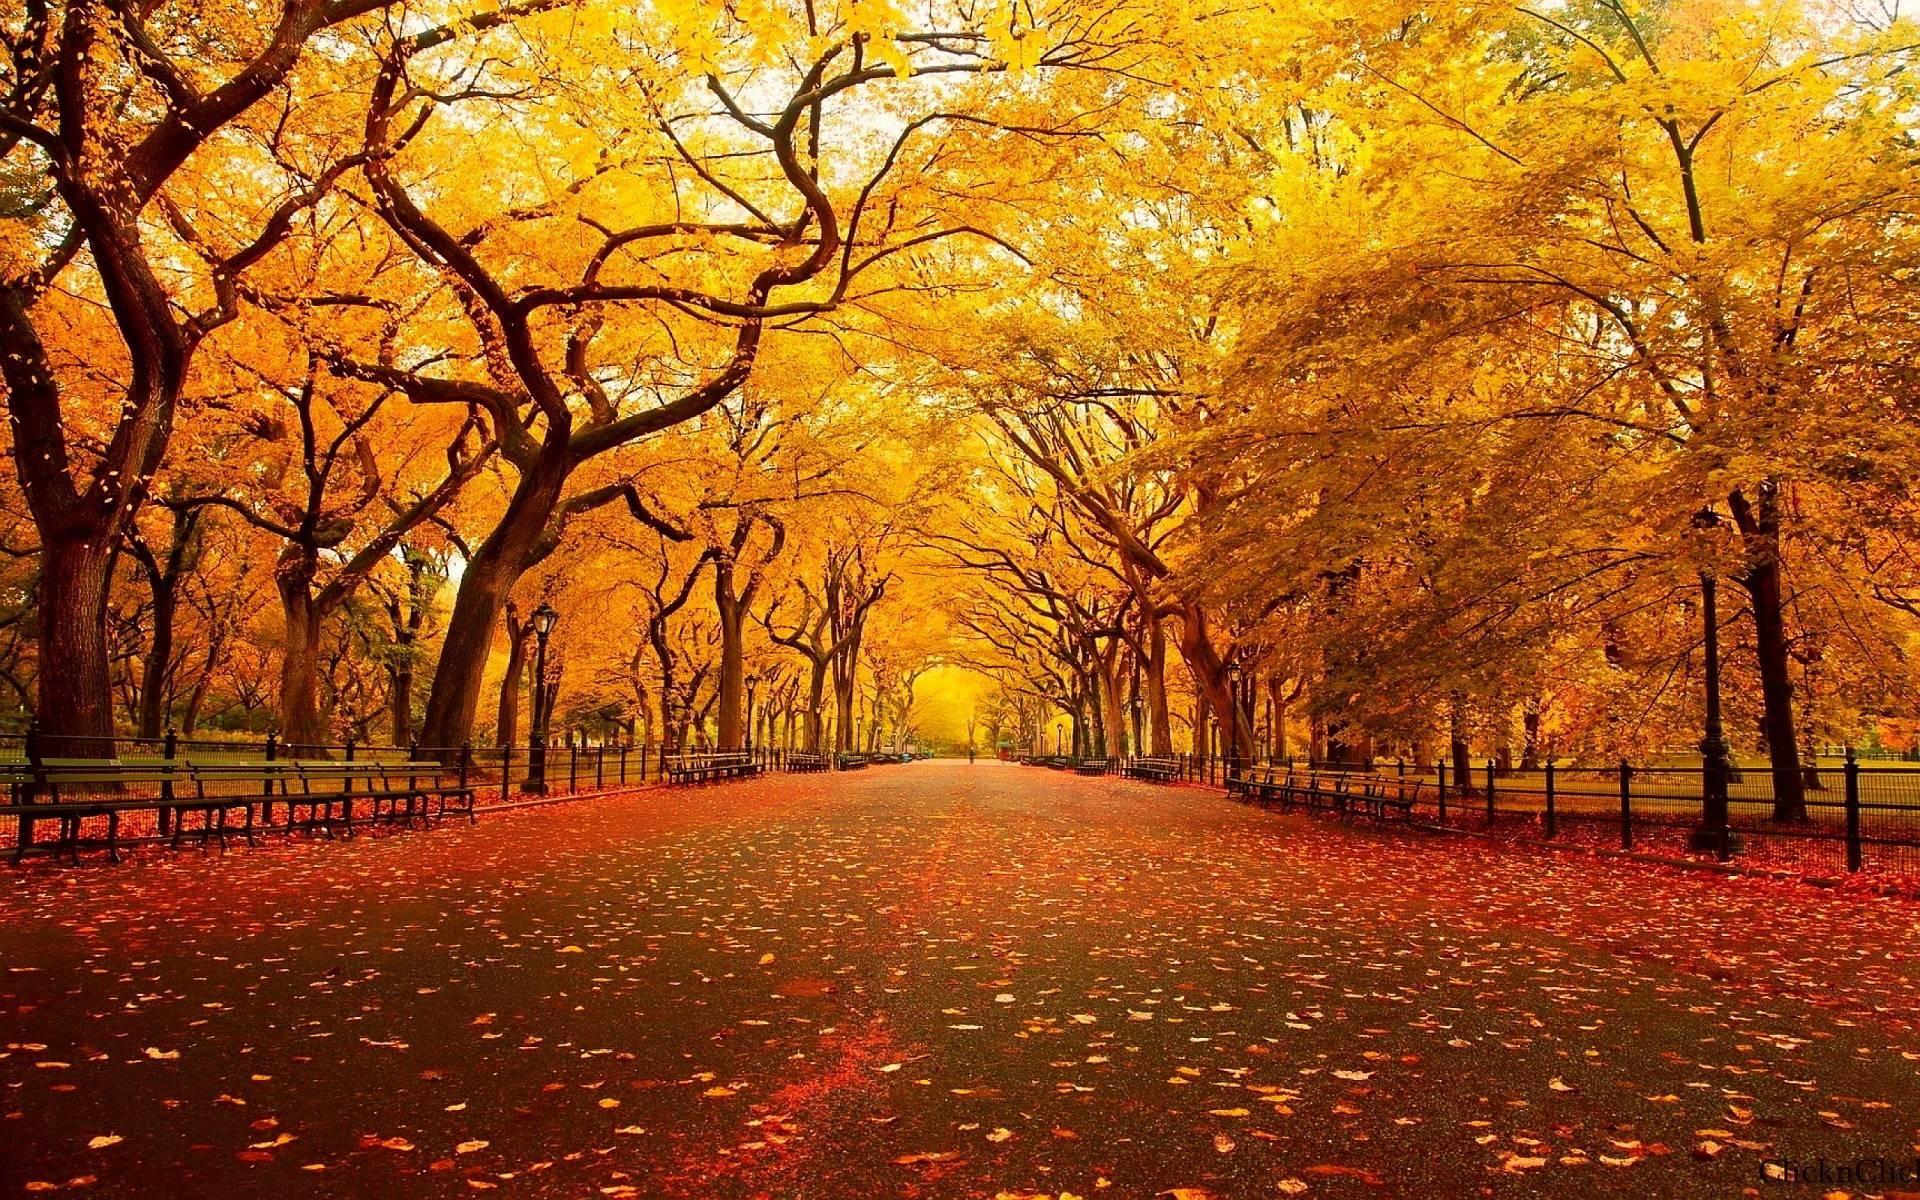 Thanksgiving Wallpaper Pictures M4B » WALLPAPERUN.COM